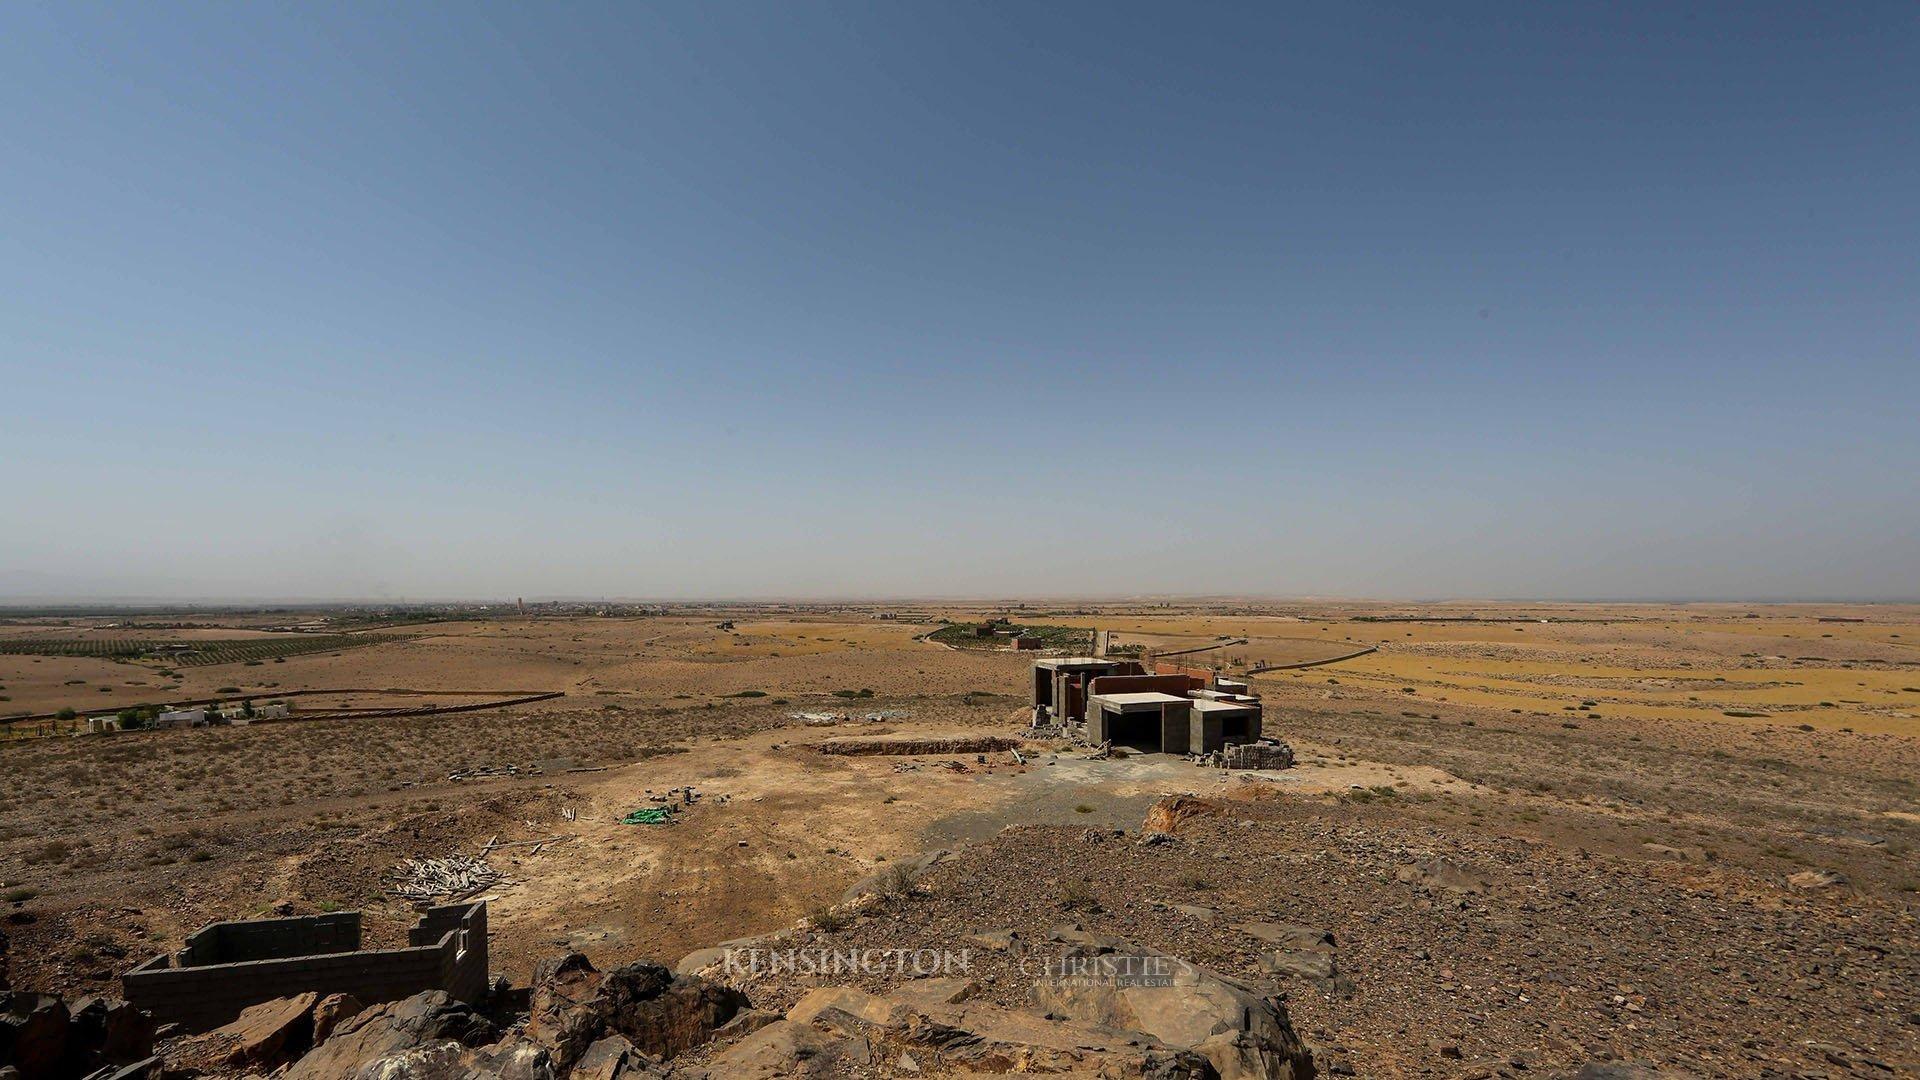 KPPM00859: Building Land Heloise Building land Marrakech Morocco